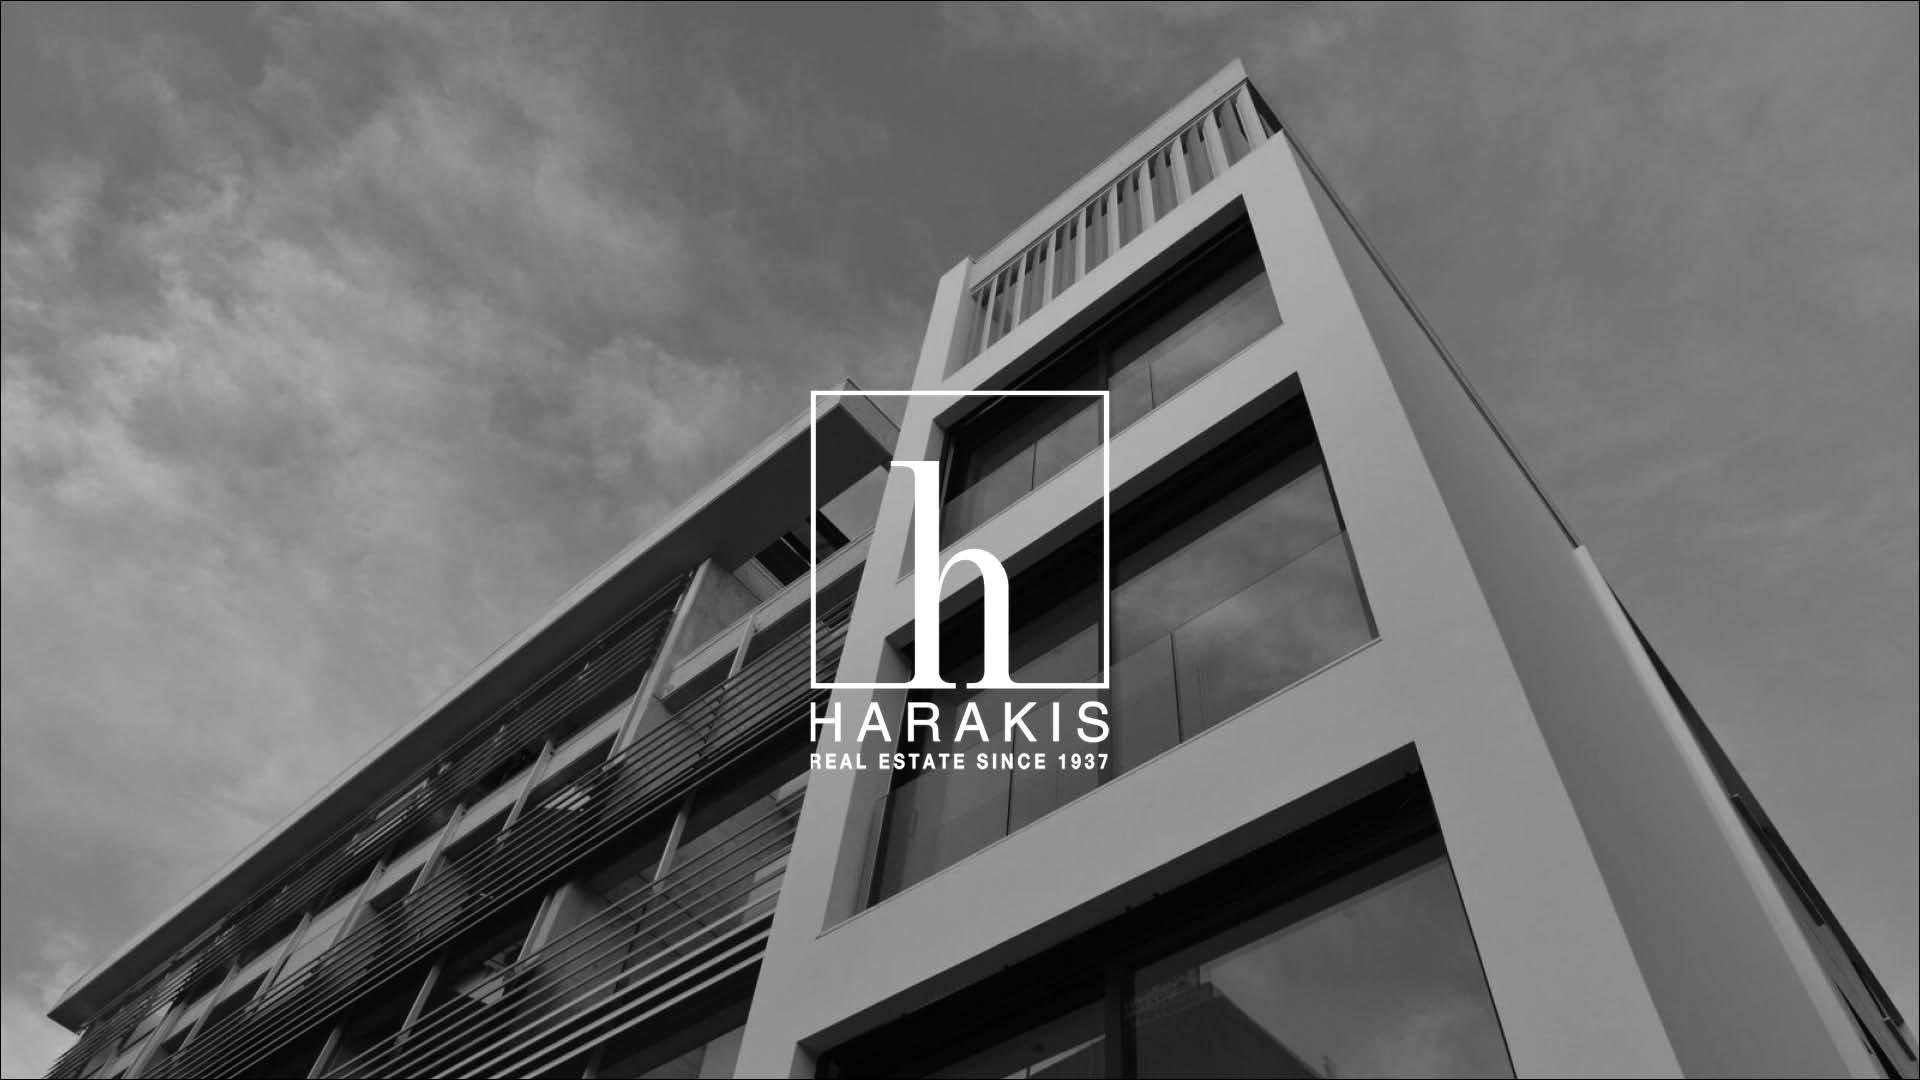 HARAKIS REAL ESTATE